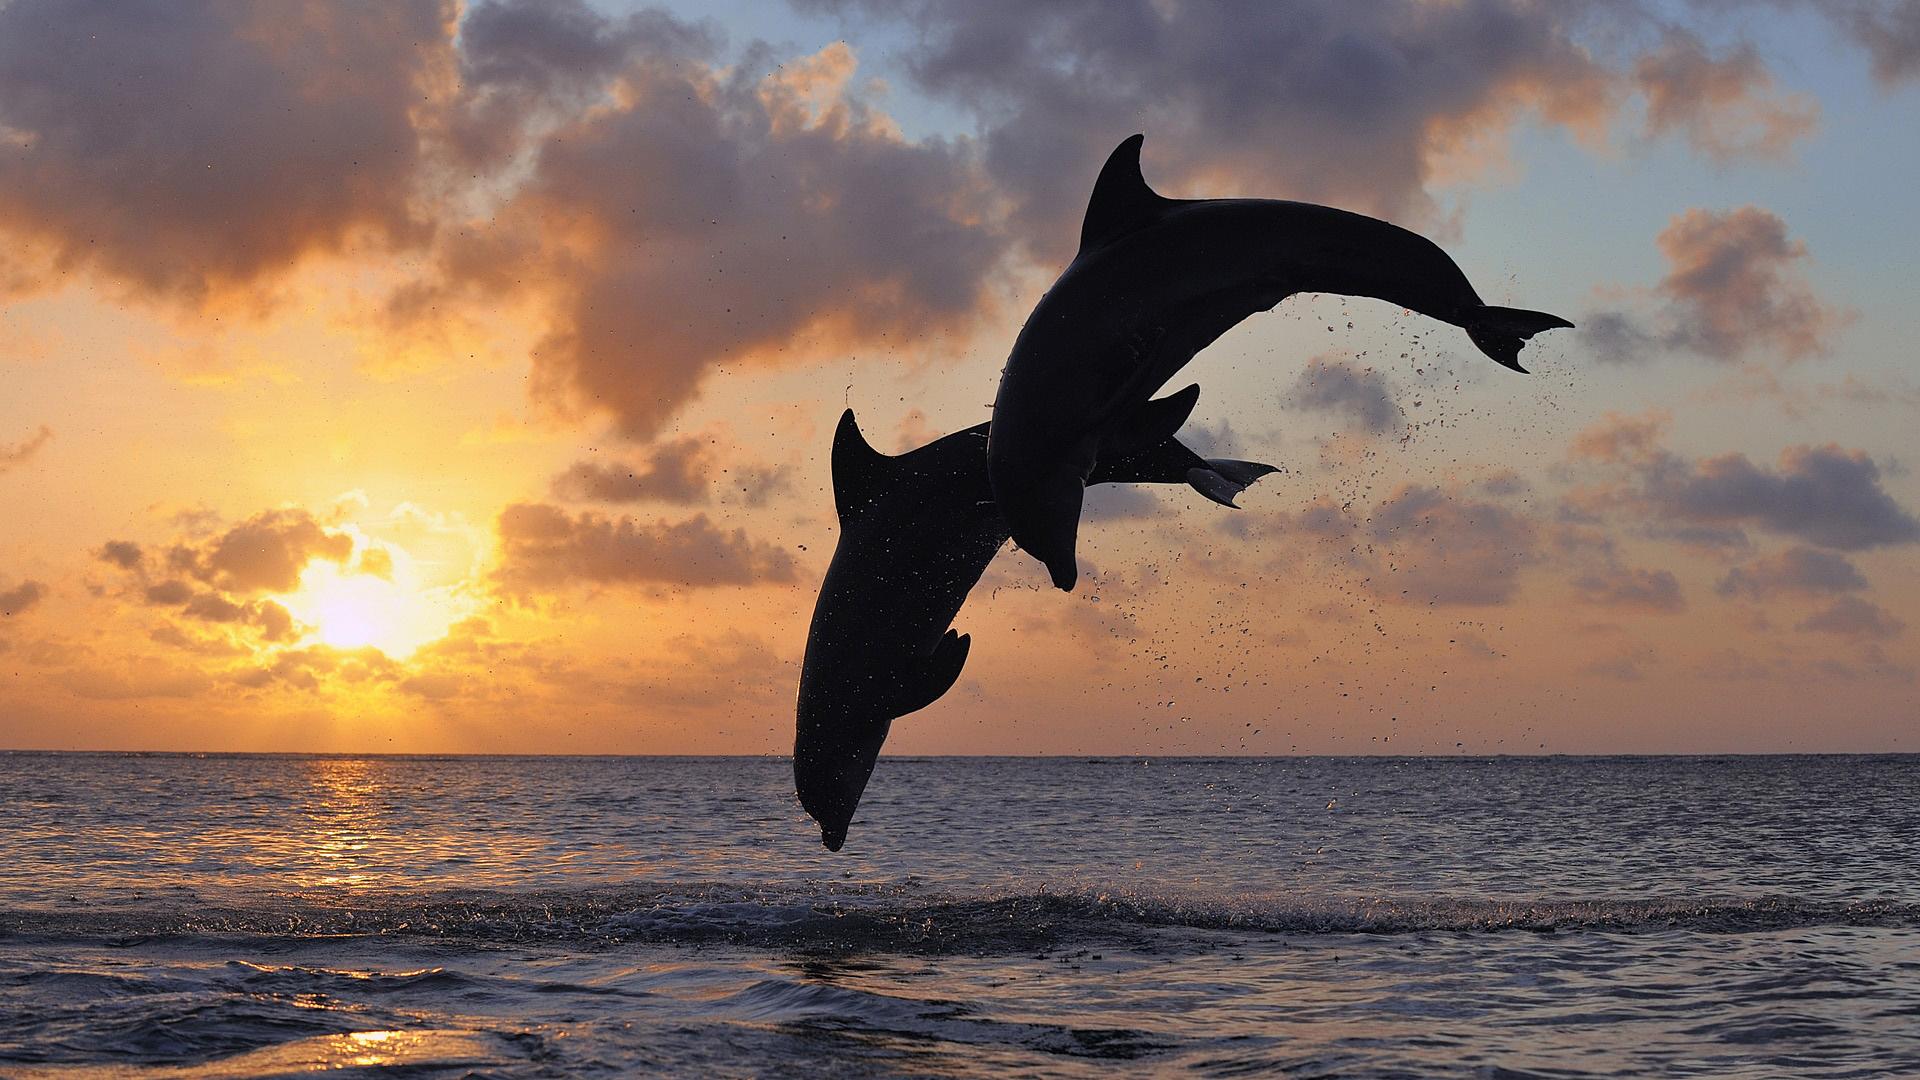 Delfin Full HD Wallpaper and Hintergrund